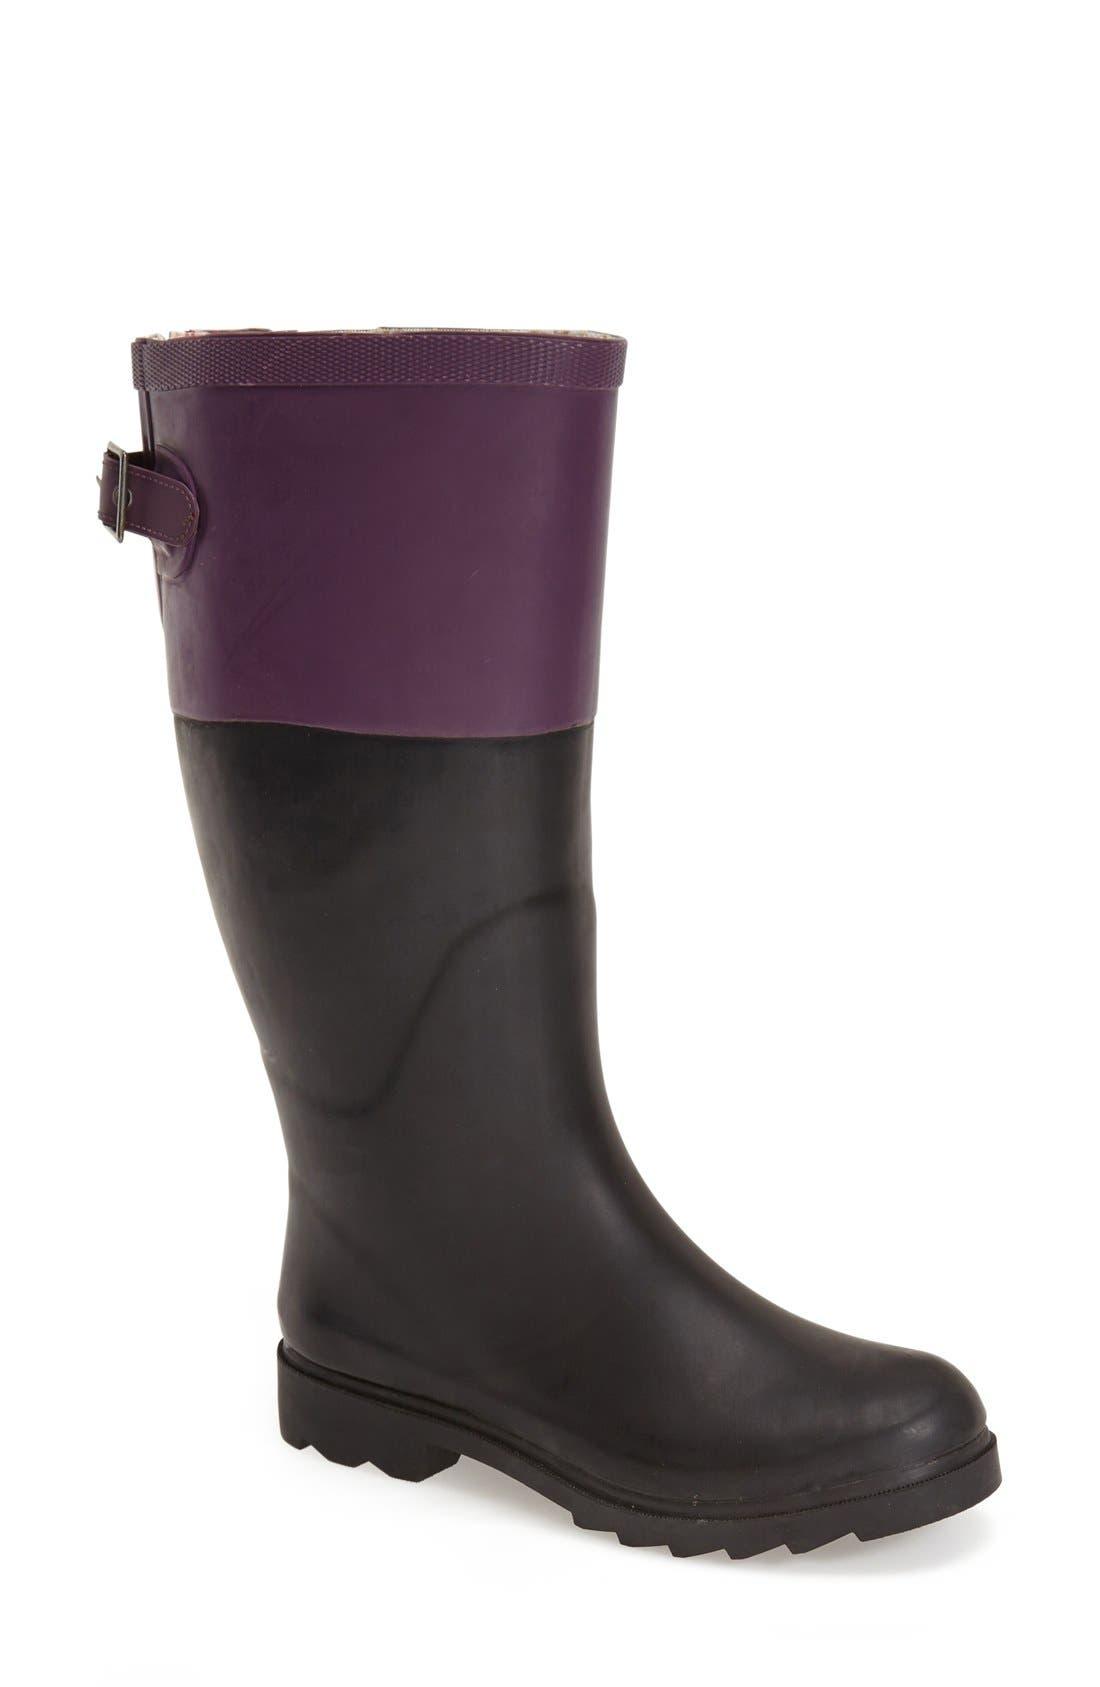 Alternate Image 1 Selected - ChookaGusset Rain Boot (Women)